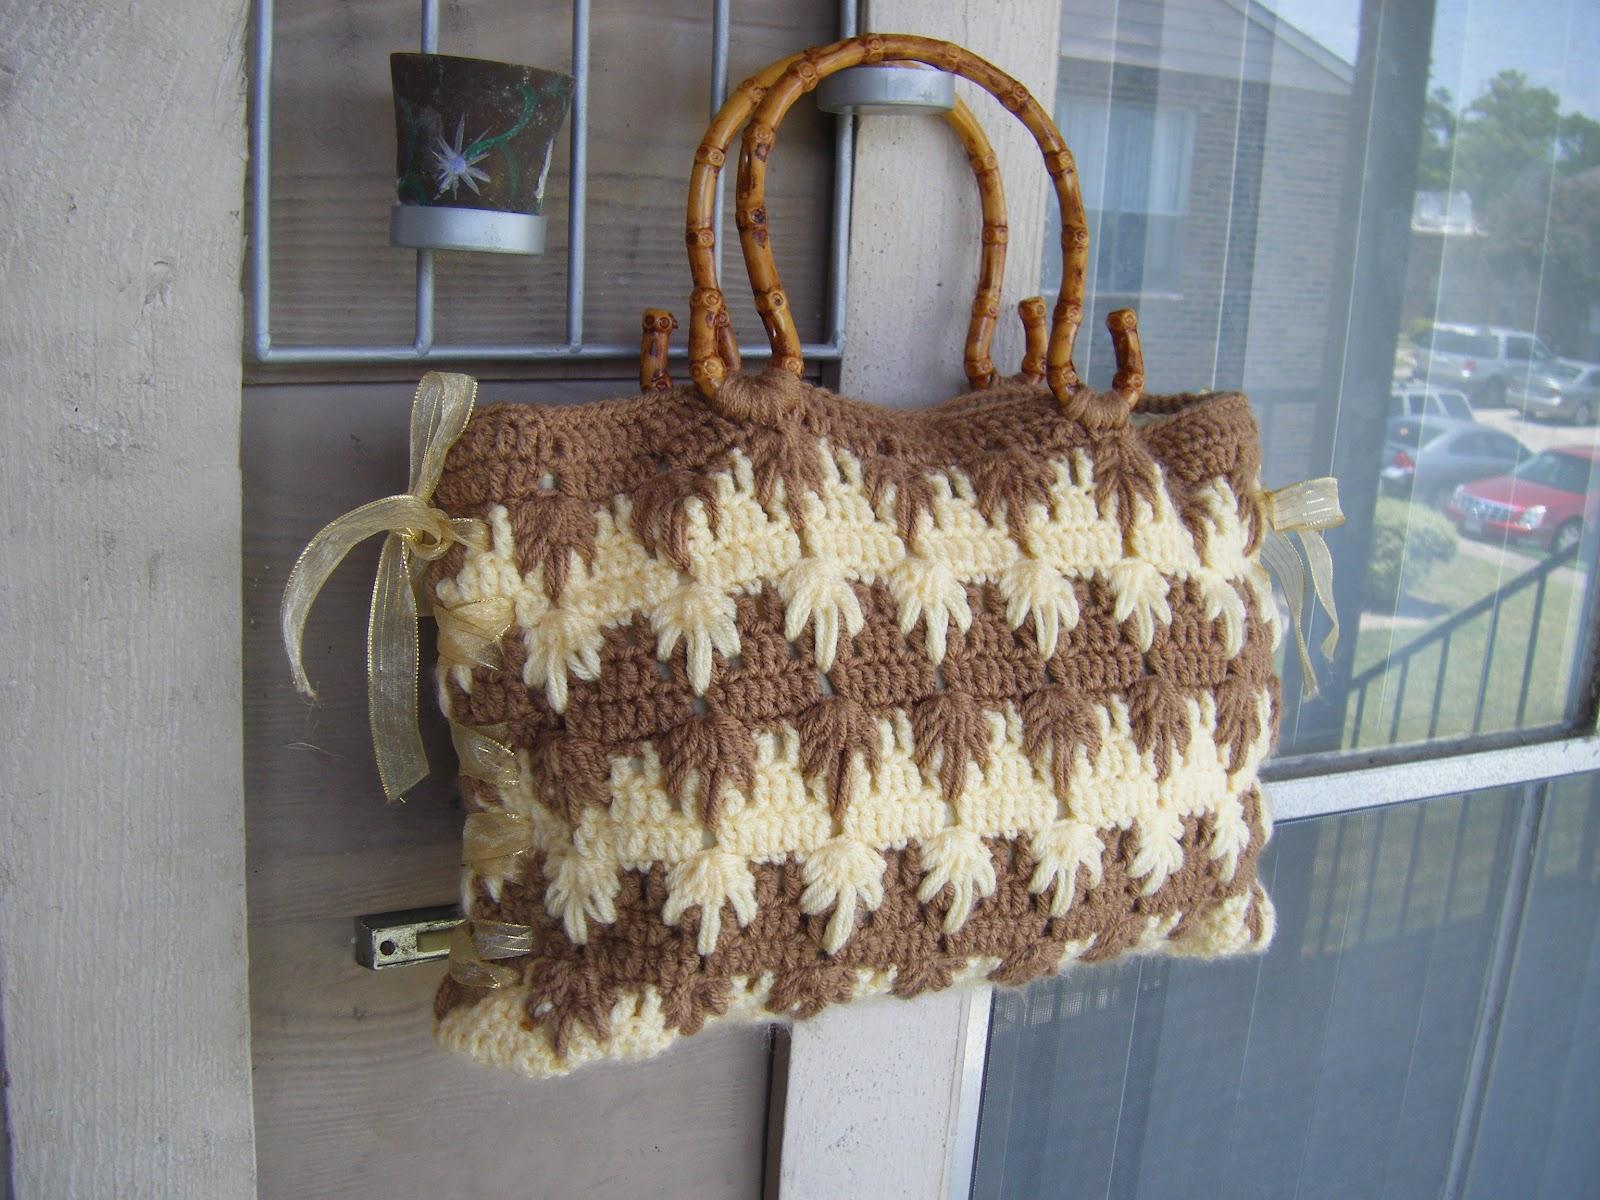 Crochet Pattern Tote Bag : Best Patterns: Raquel Crochet Tote Bag Pattern